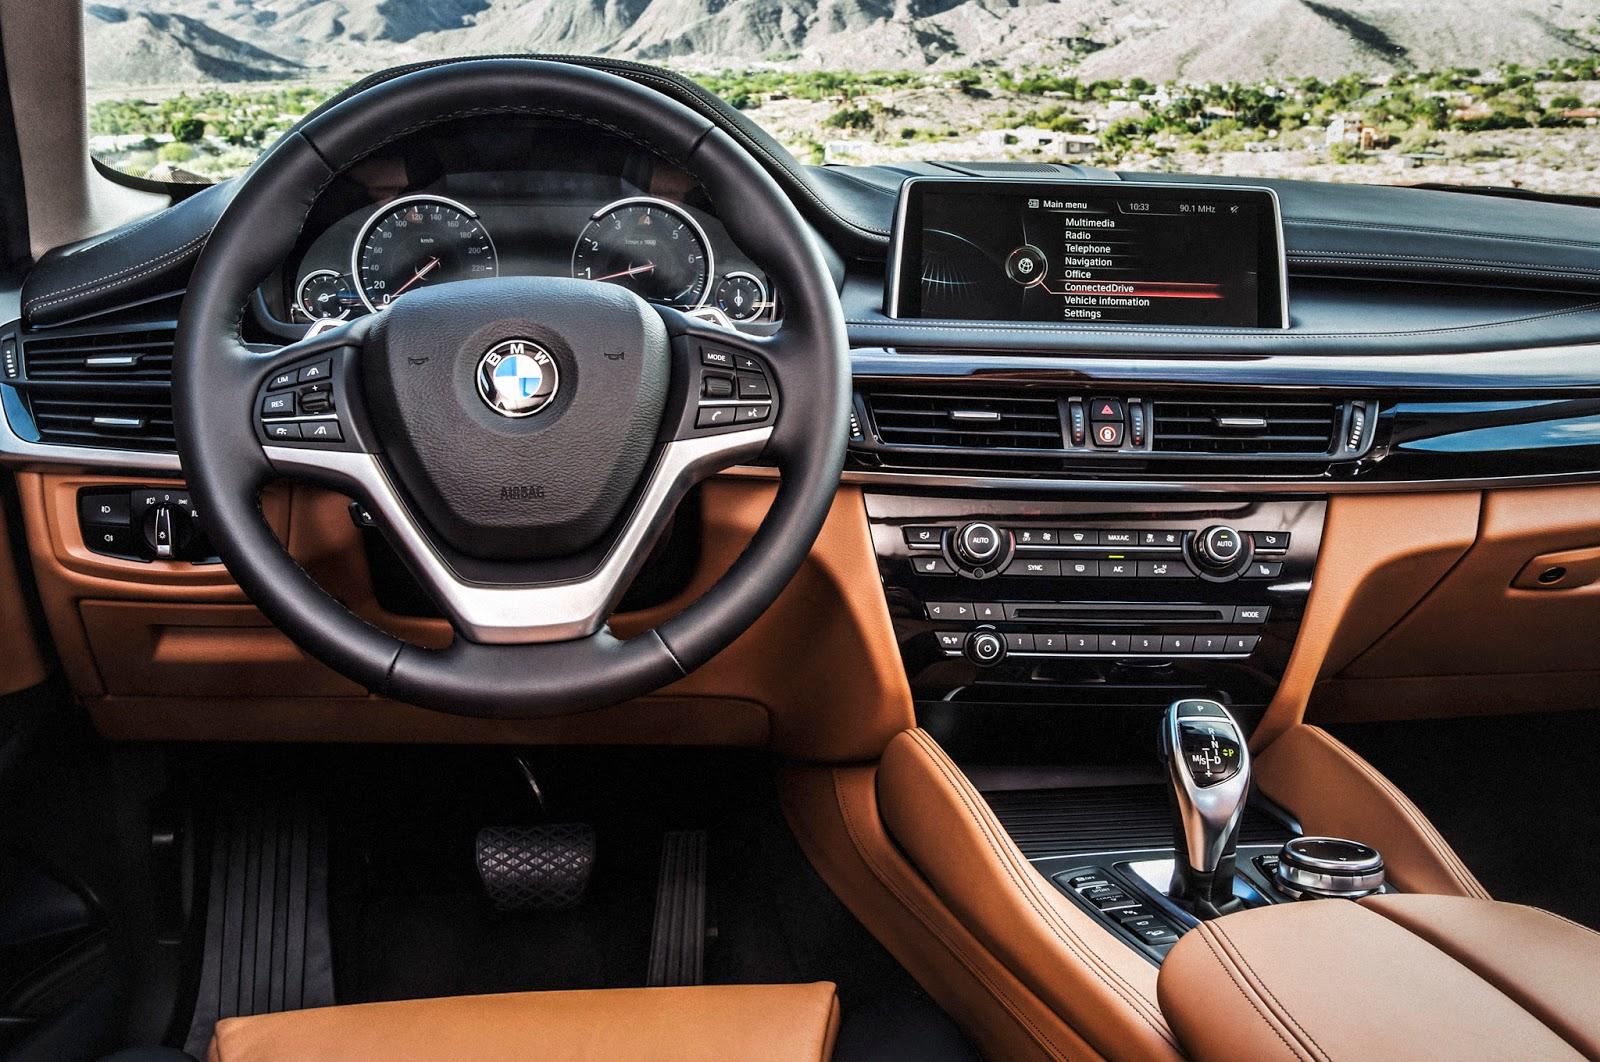 BMW X6 HD Image